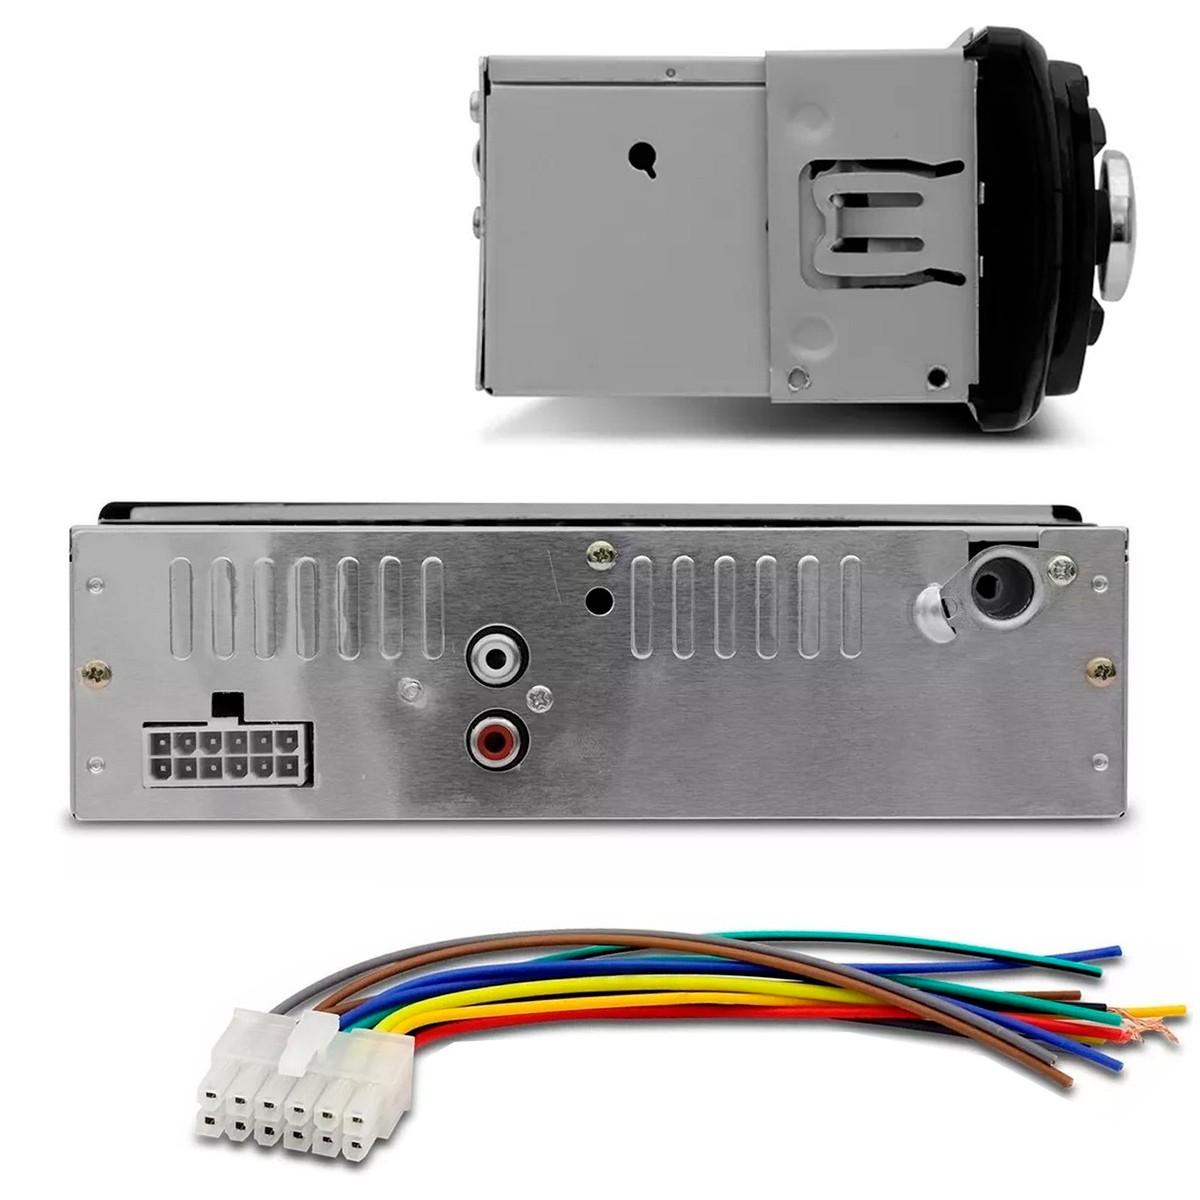 RADIO FIRSTOPTION 6630BN FM/USB/SD/AUX/BLUETOOTH C/ CONTROLE